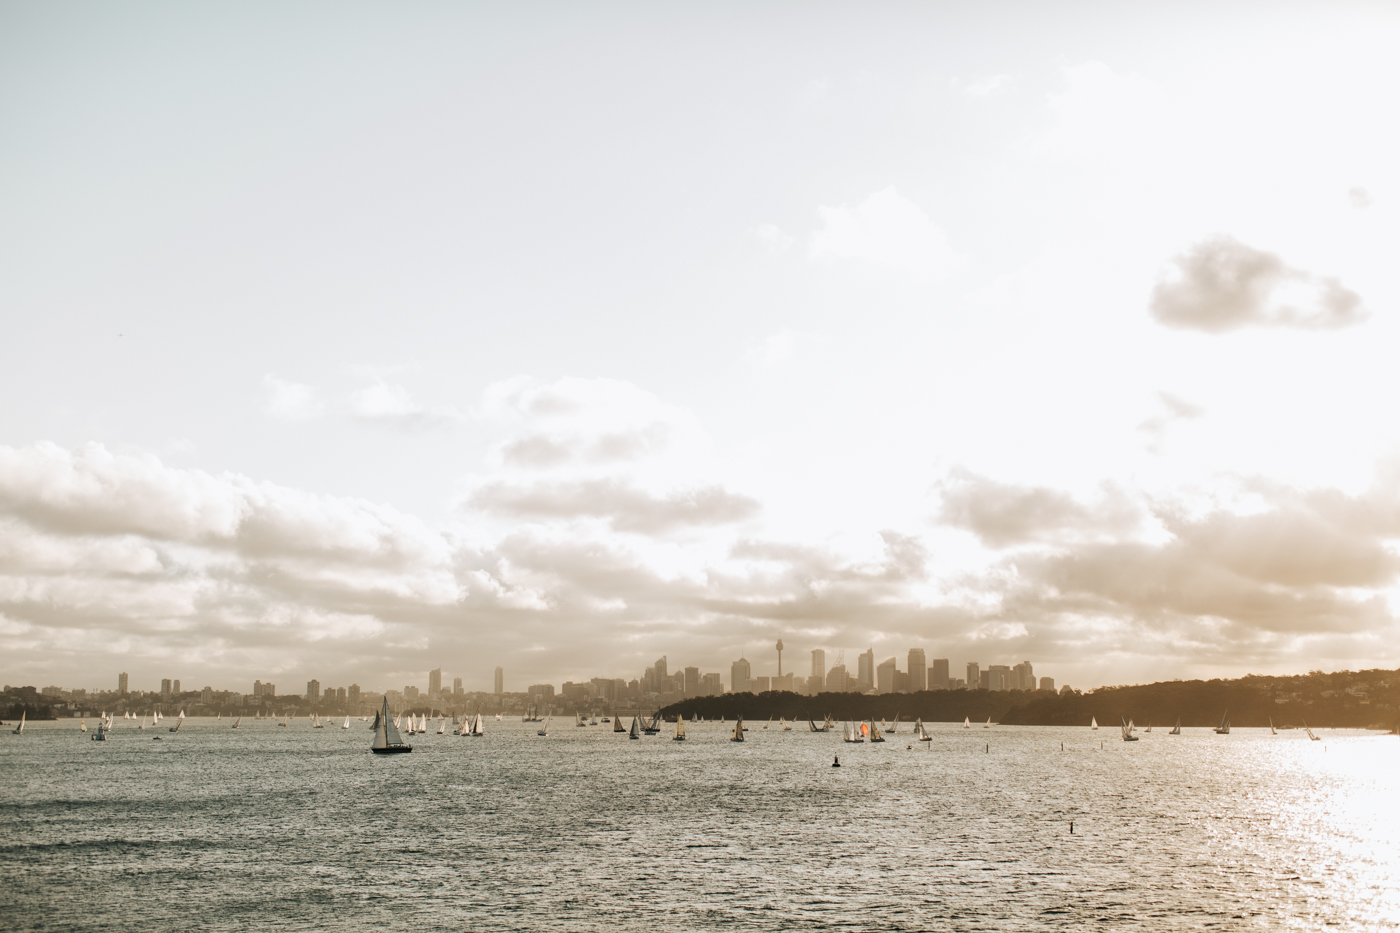 James & Caitie Engagement - Watsons Bay - Samantha Heather Photography-26.jpg